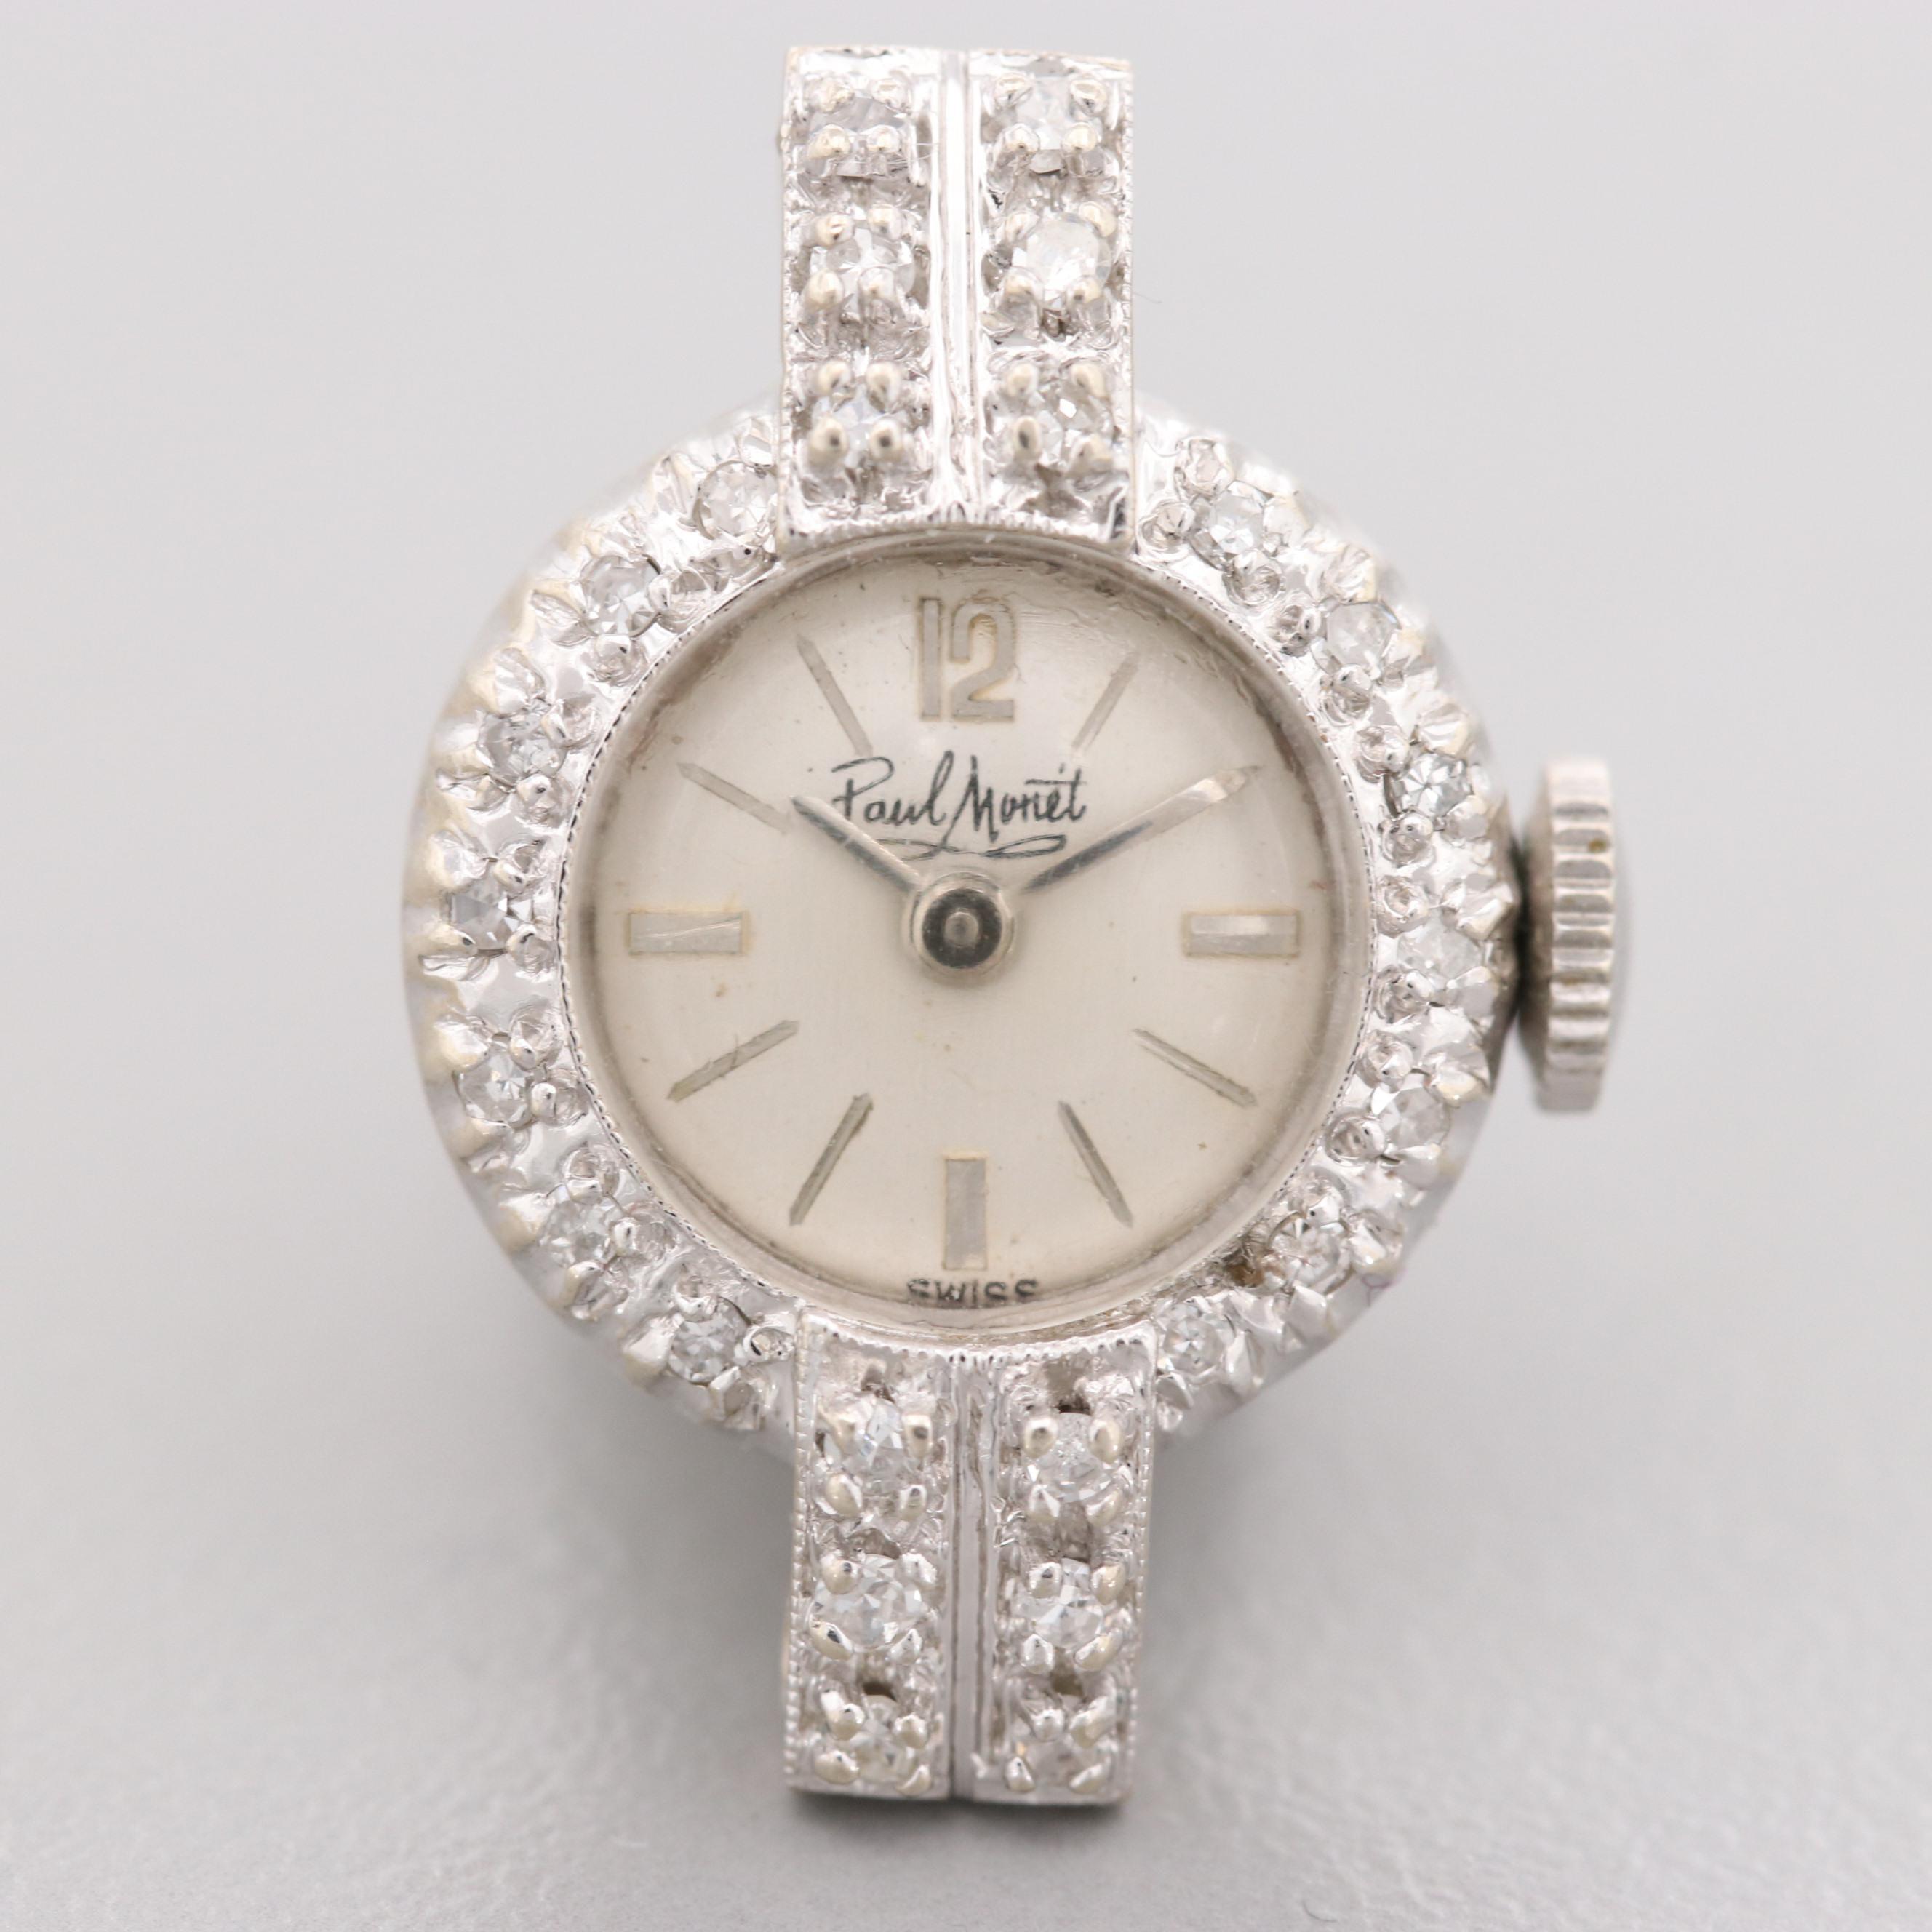 Paul Monet 14K White Gold Diamond Wristwatch